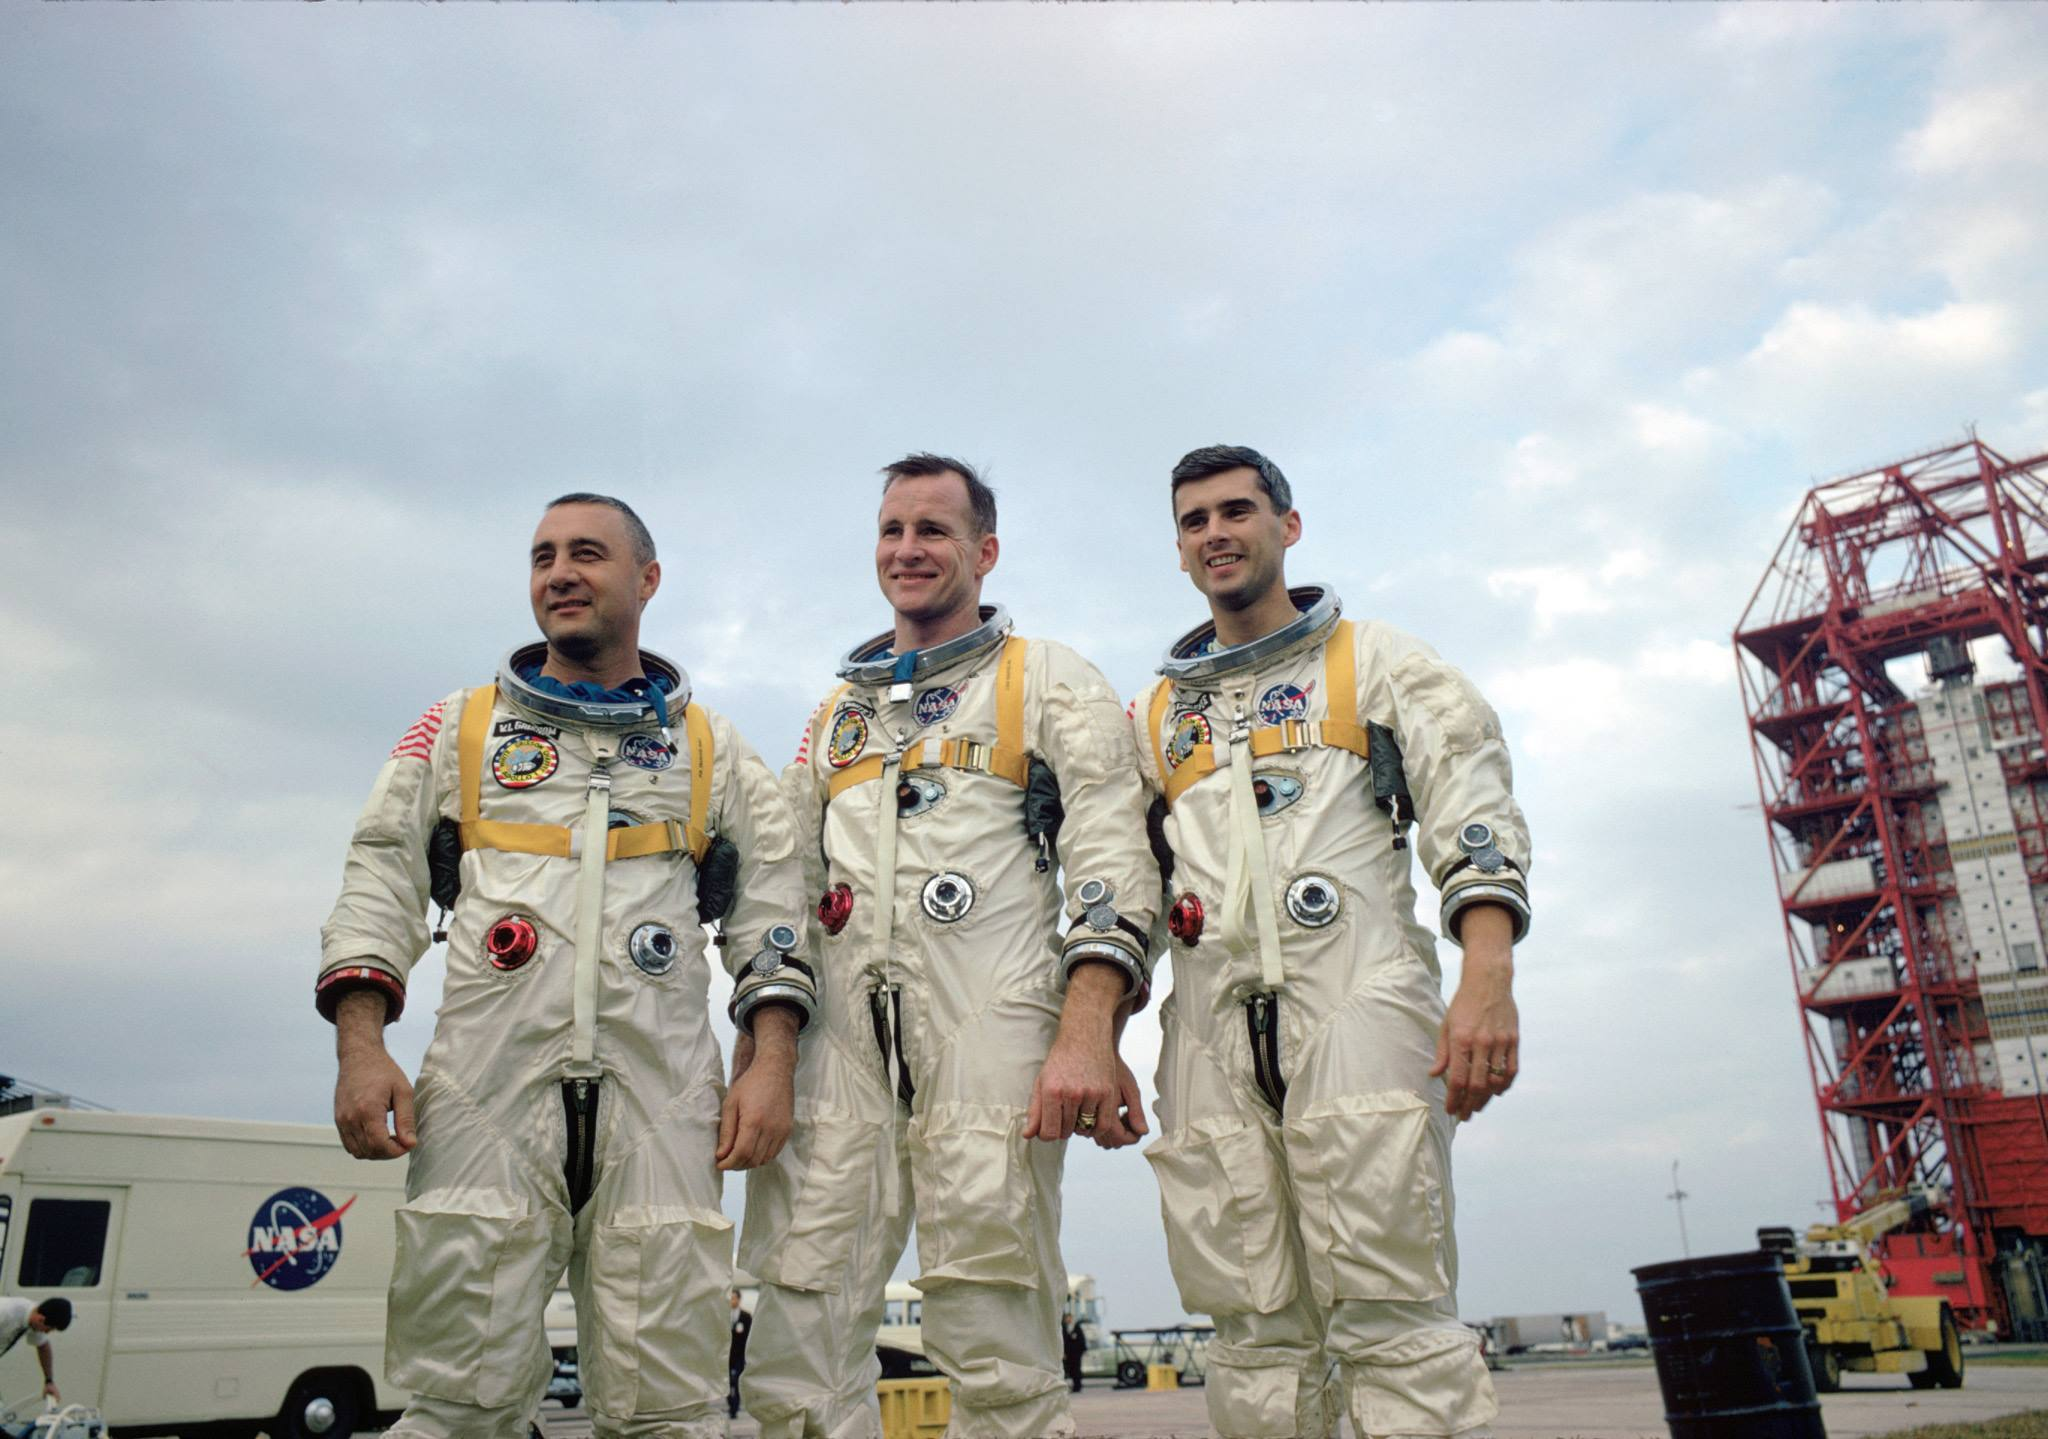 Remembering the Crew of Apollo 1